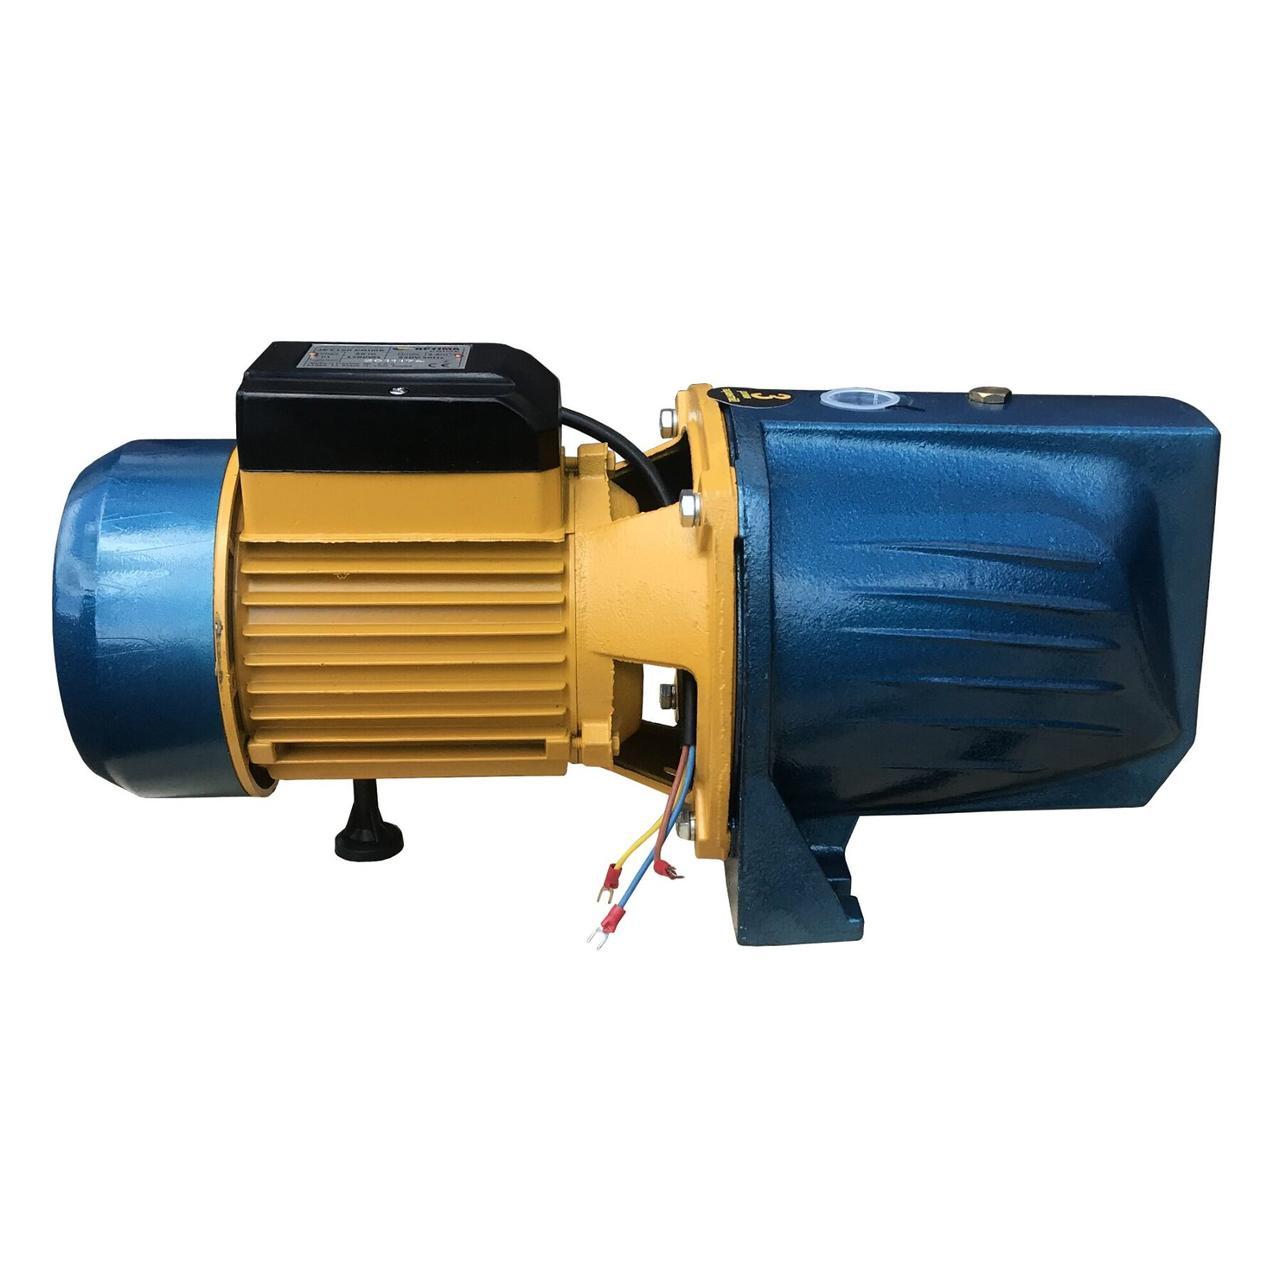 Насос центробежный Optima JET150 PRIME 1,5 кВт